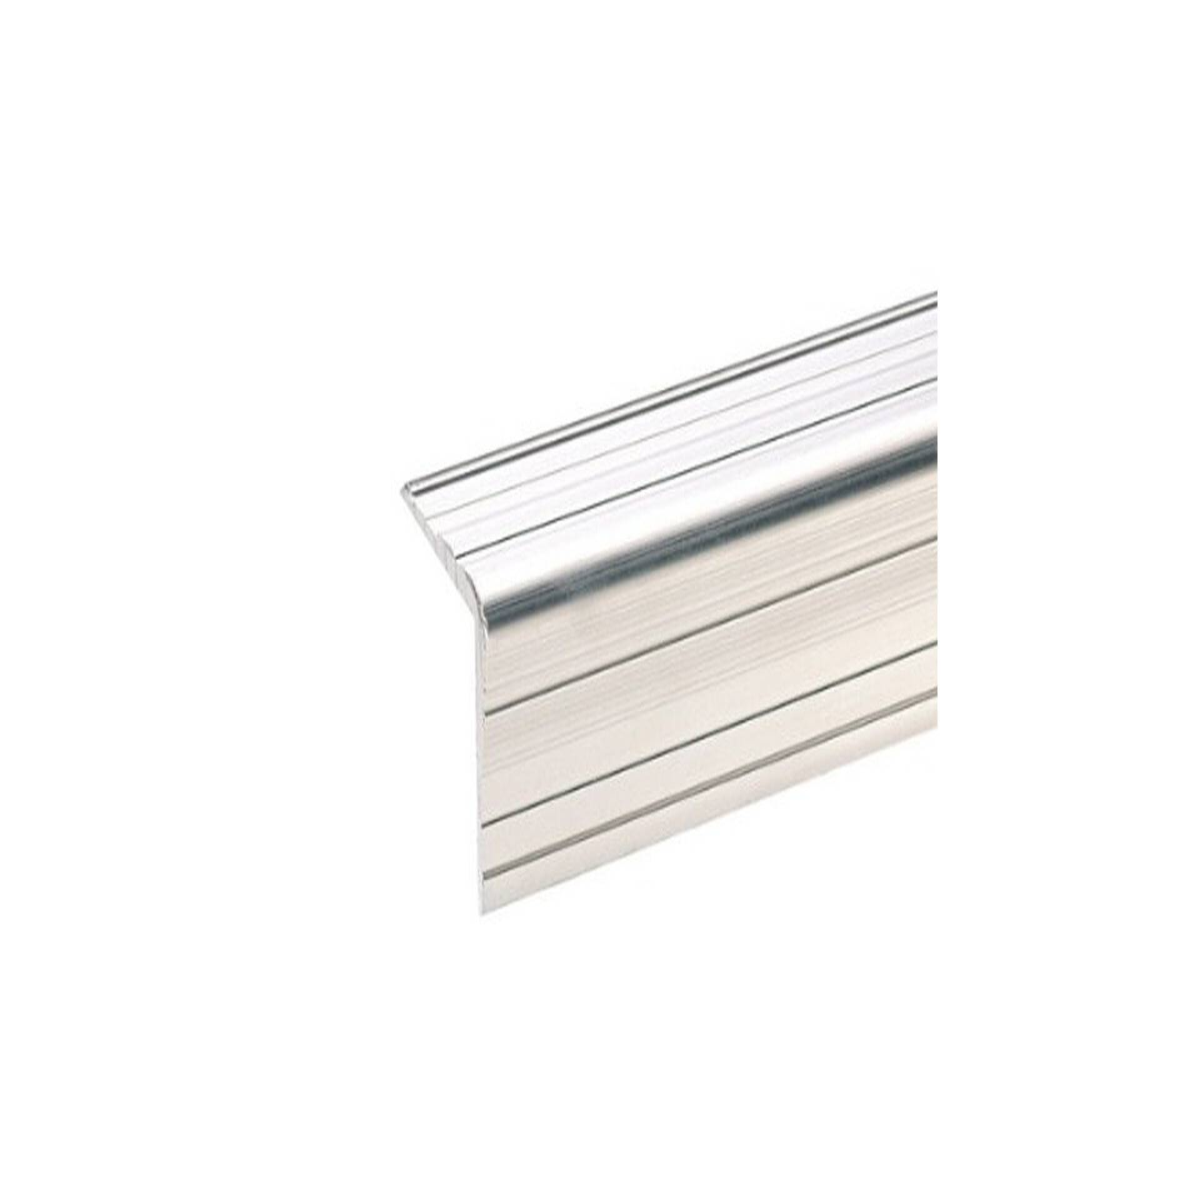 1 m adam hall 6110 aluminium kantenschutz 33 x 33 mm mit nietenkopfri. Black Bedroom Furniture Sets. Home Design Ideas